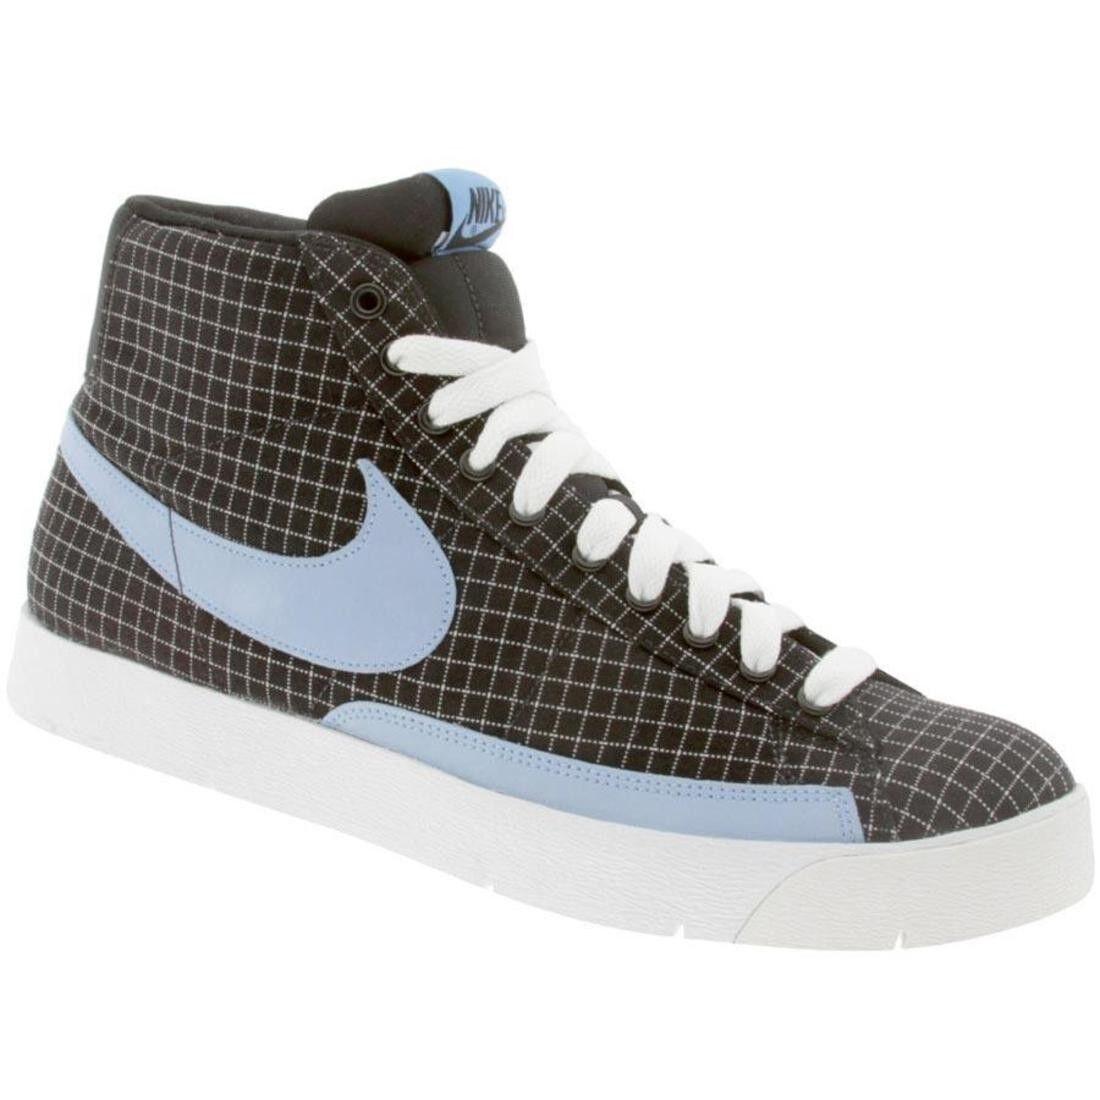 316382-041 Nike Super Blazer High Premium Noir University Bleu Blanc